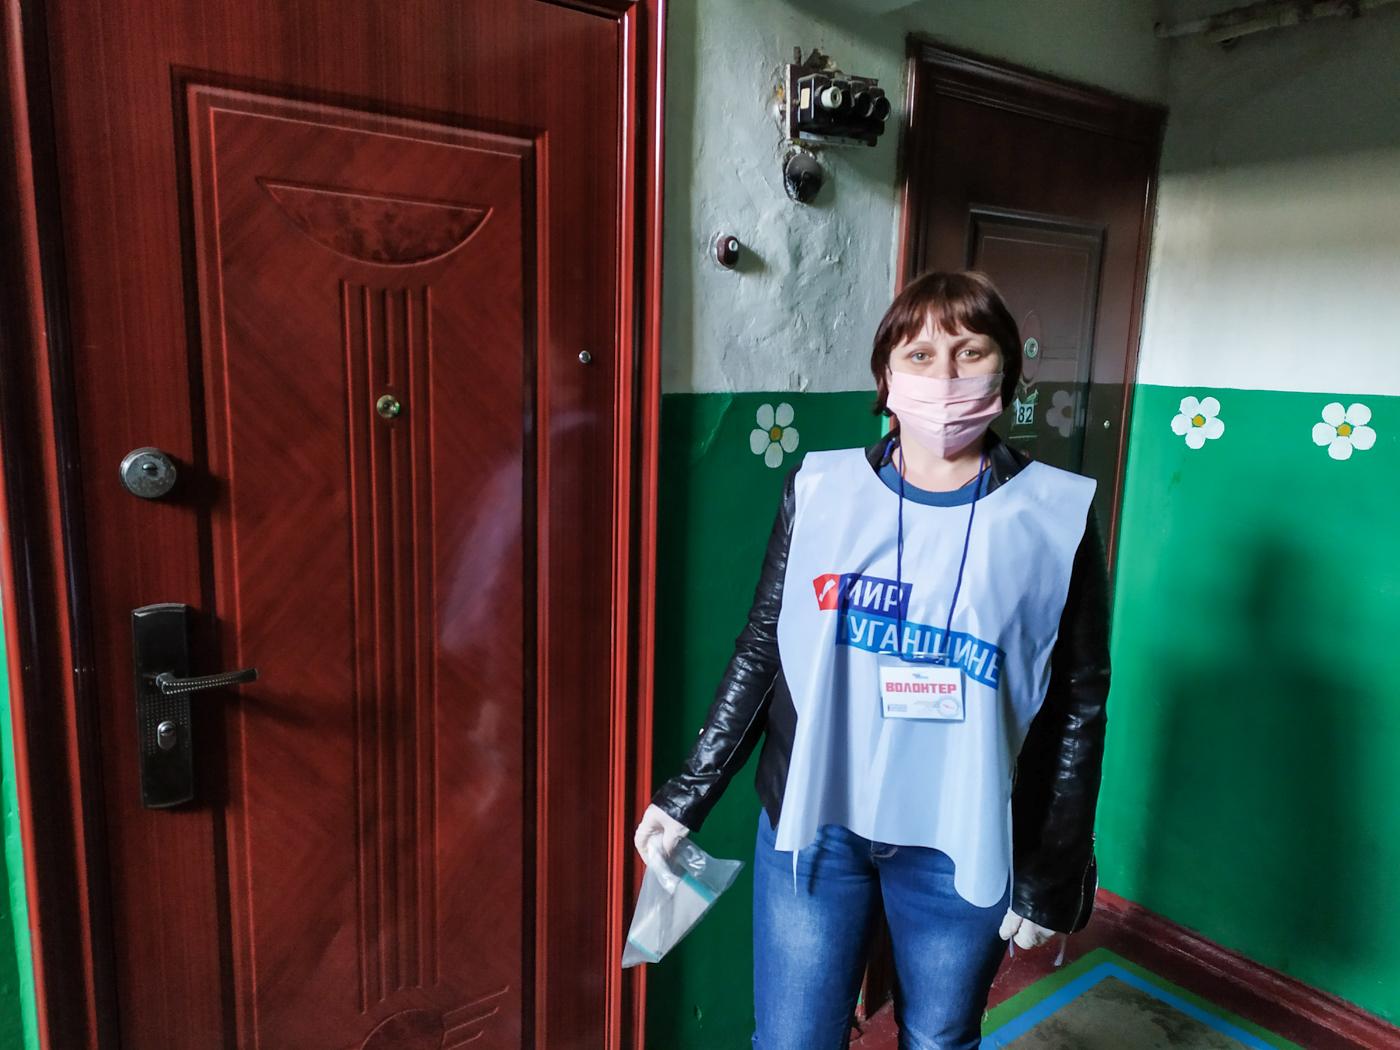 Волонтёры ОД «Мир Луганщине» помогли жительнице посёлка Родаково